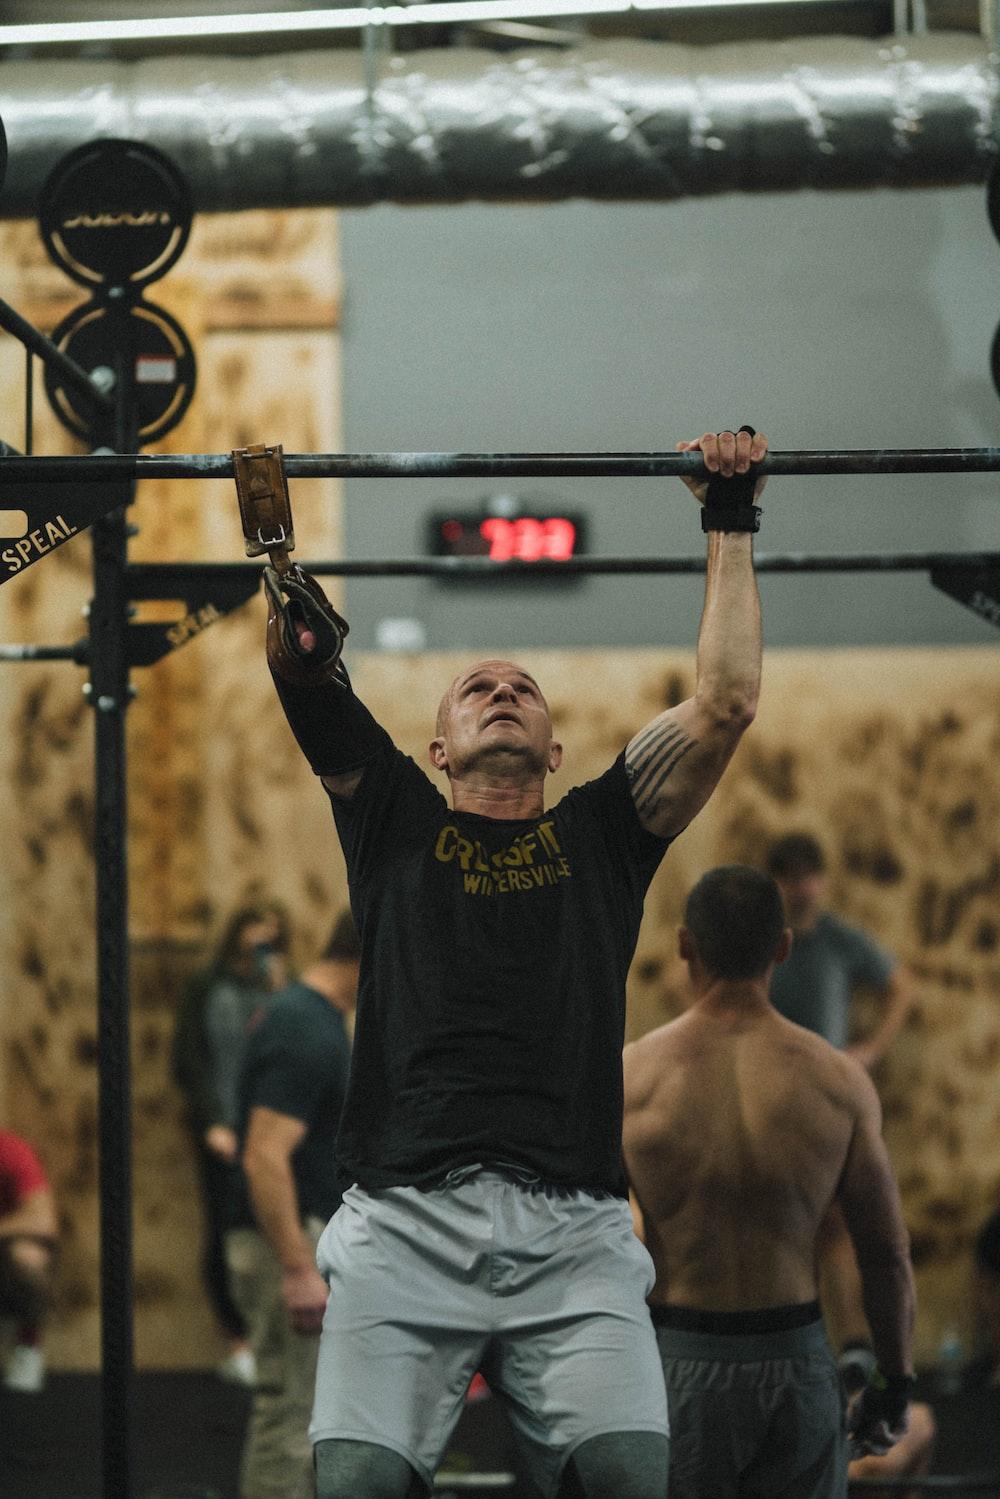 man in black crew neck t-shirt and gray shorts holding black metal bar